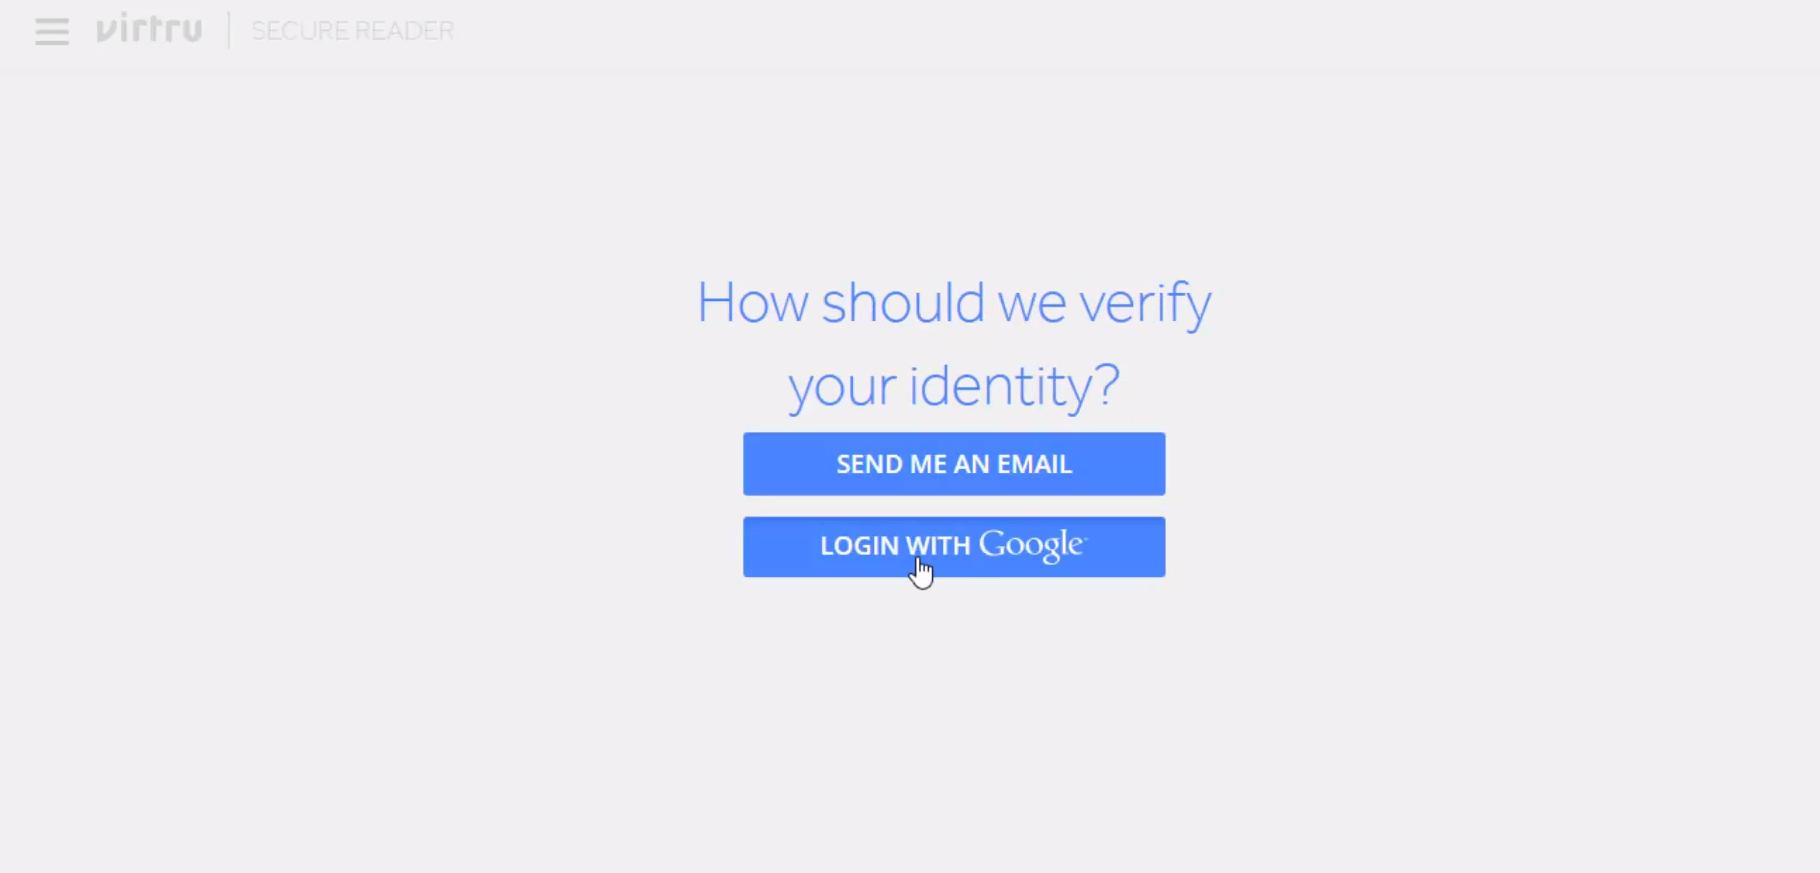 Verying recipient identity using Virtru